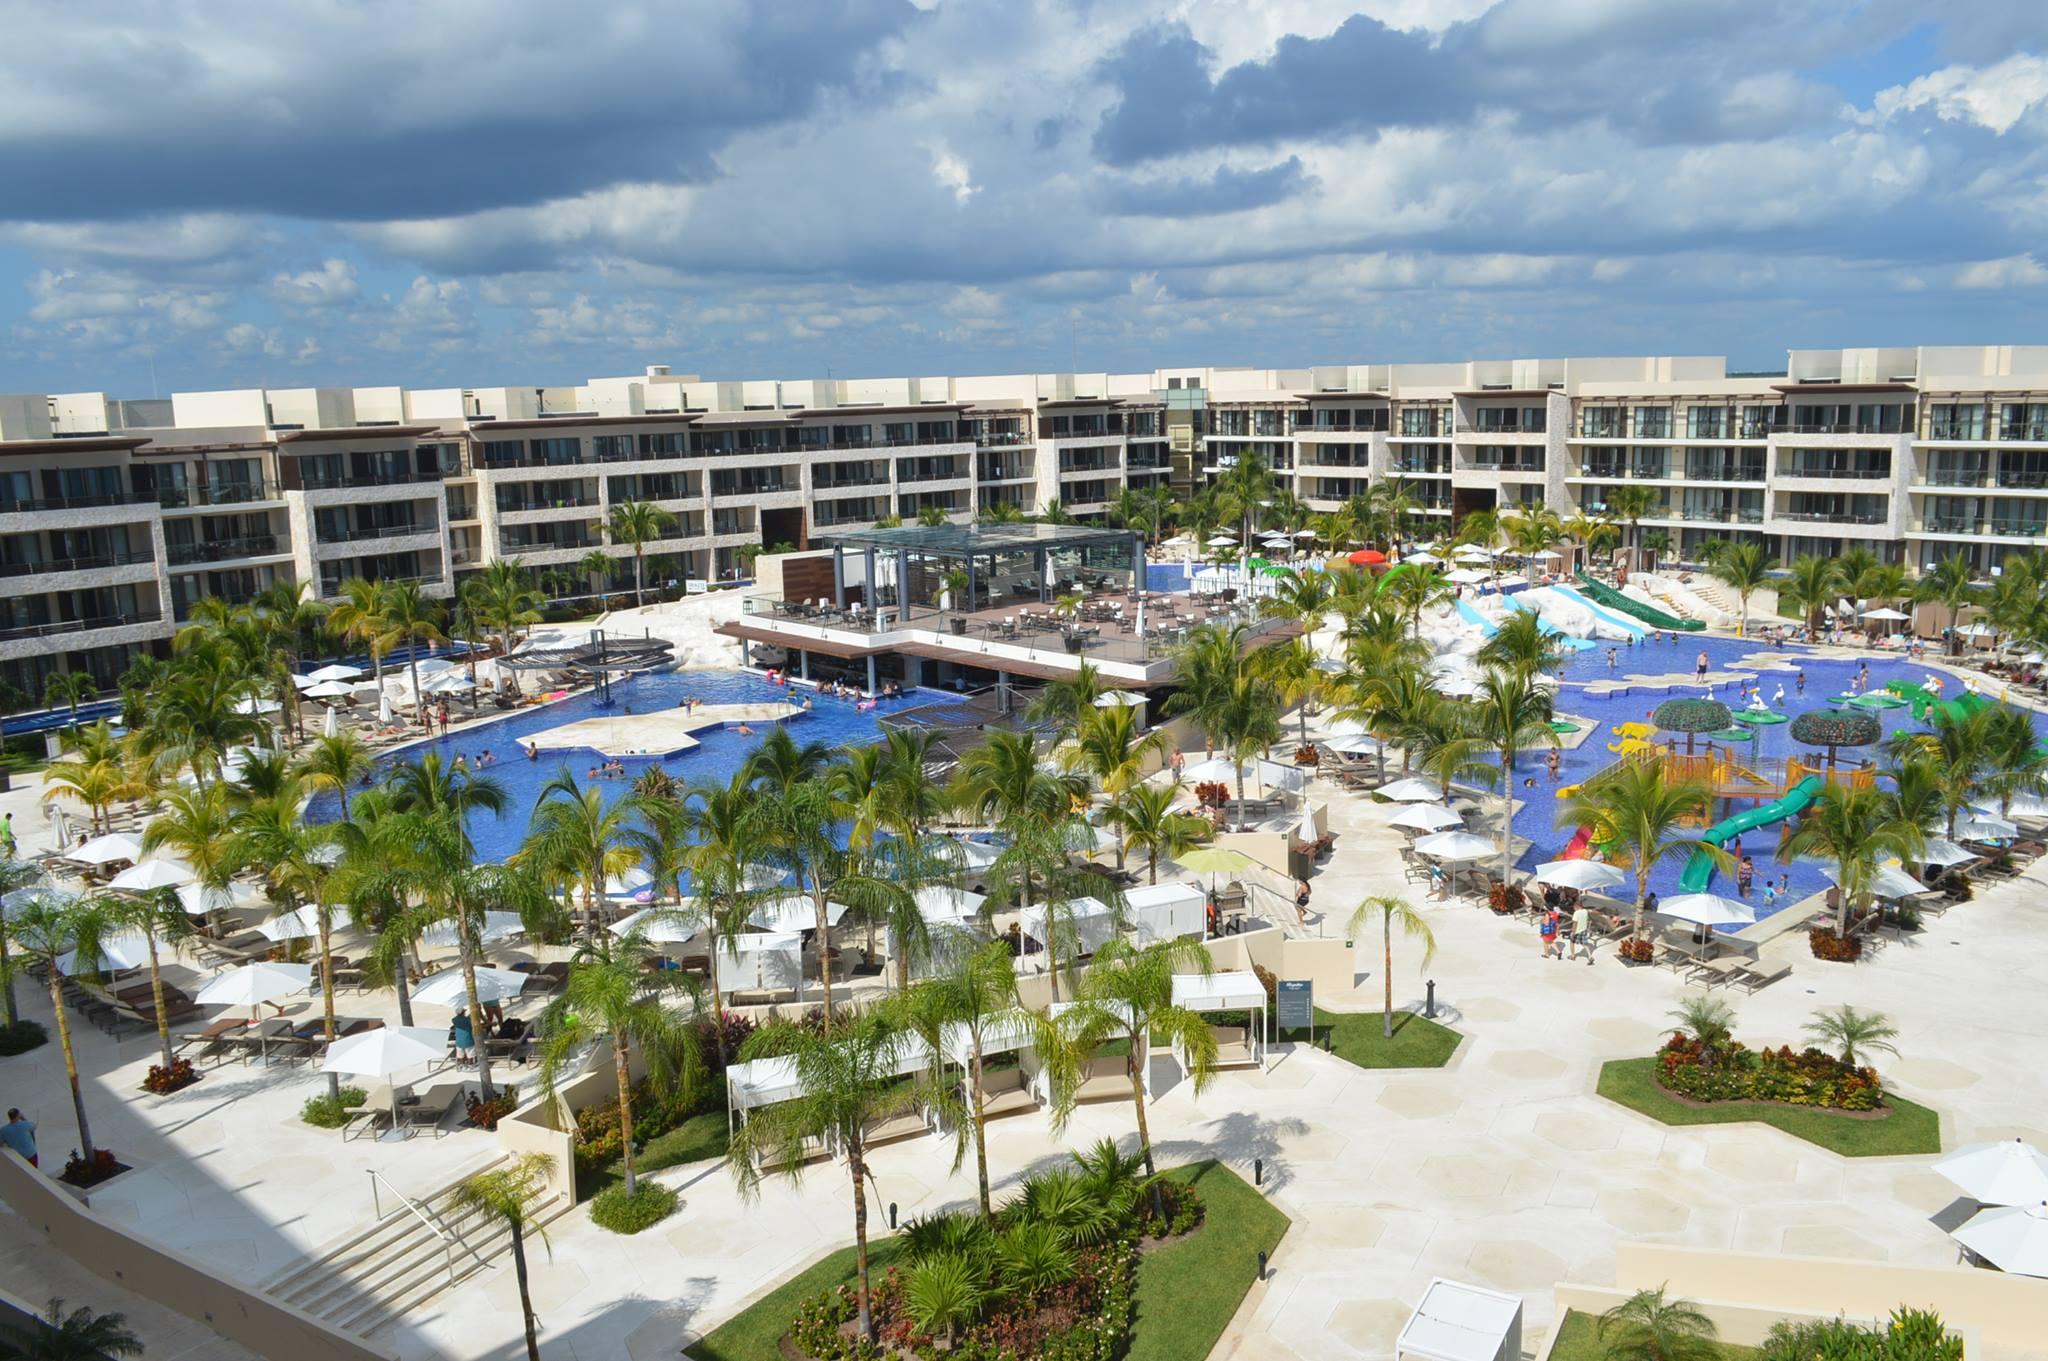 Royalton Riviera Cancun1.jpg